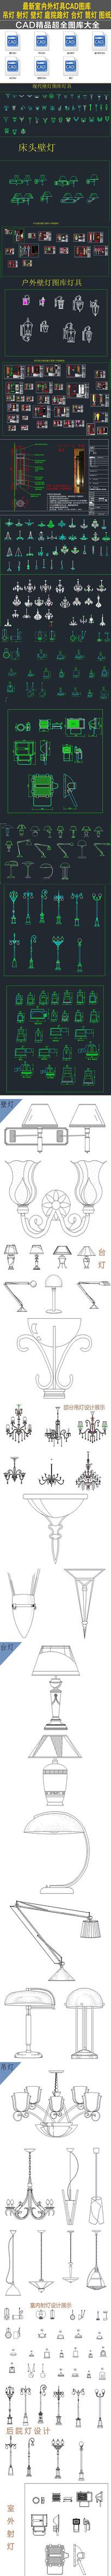 CAD室内设计常用灯具图库